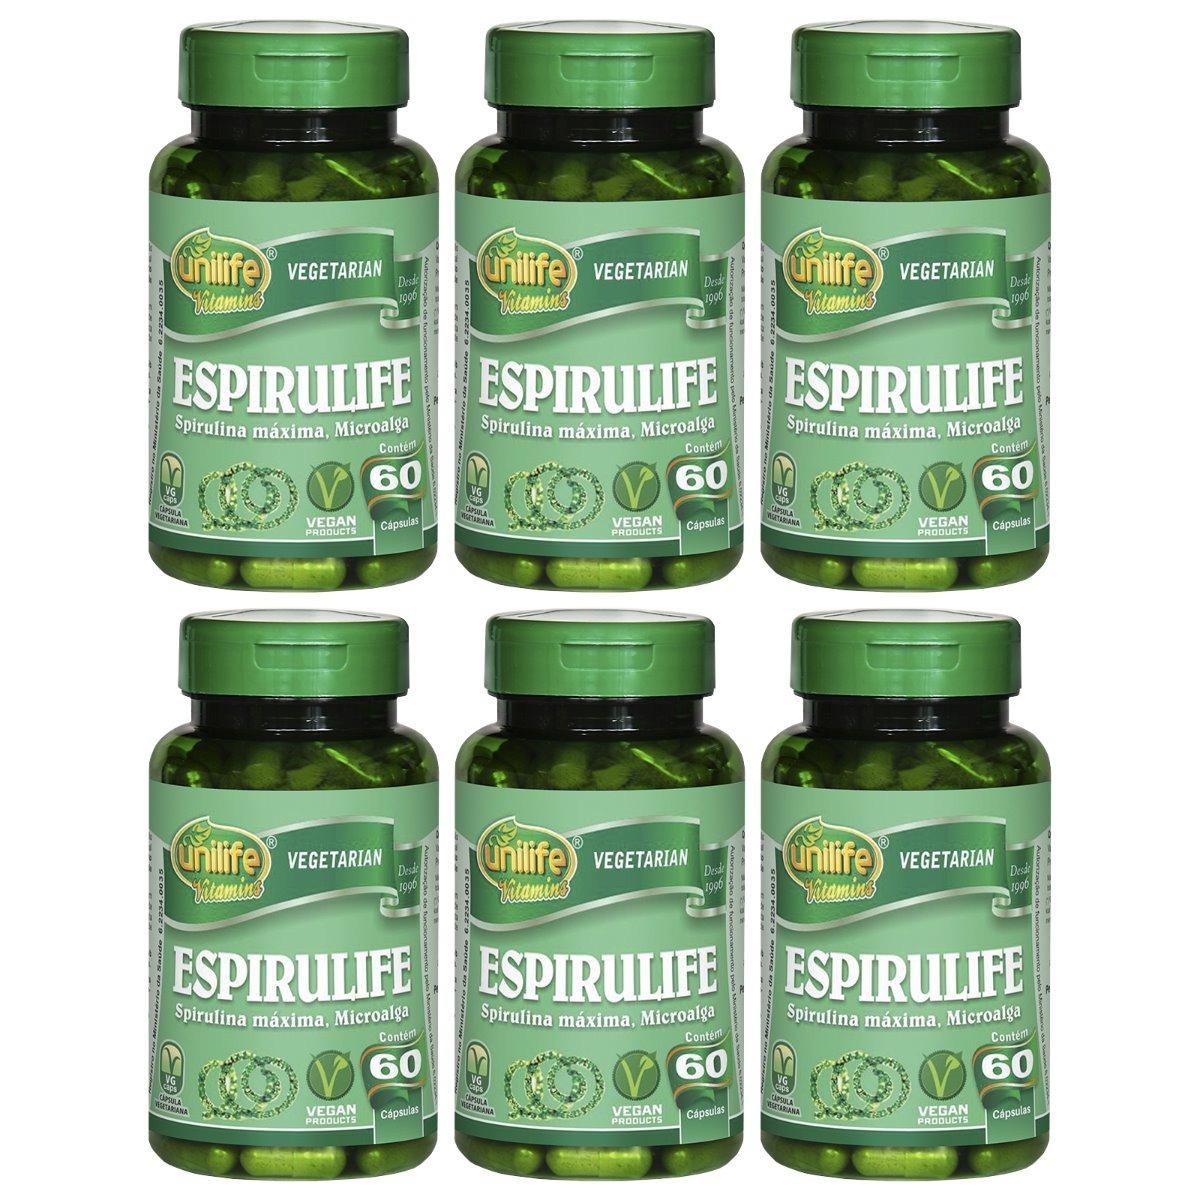 Spirulina Espirulife 60 Cápsulas 500mg Unilife Kit 6 Unidades